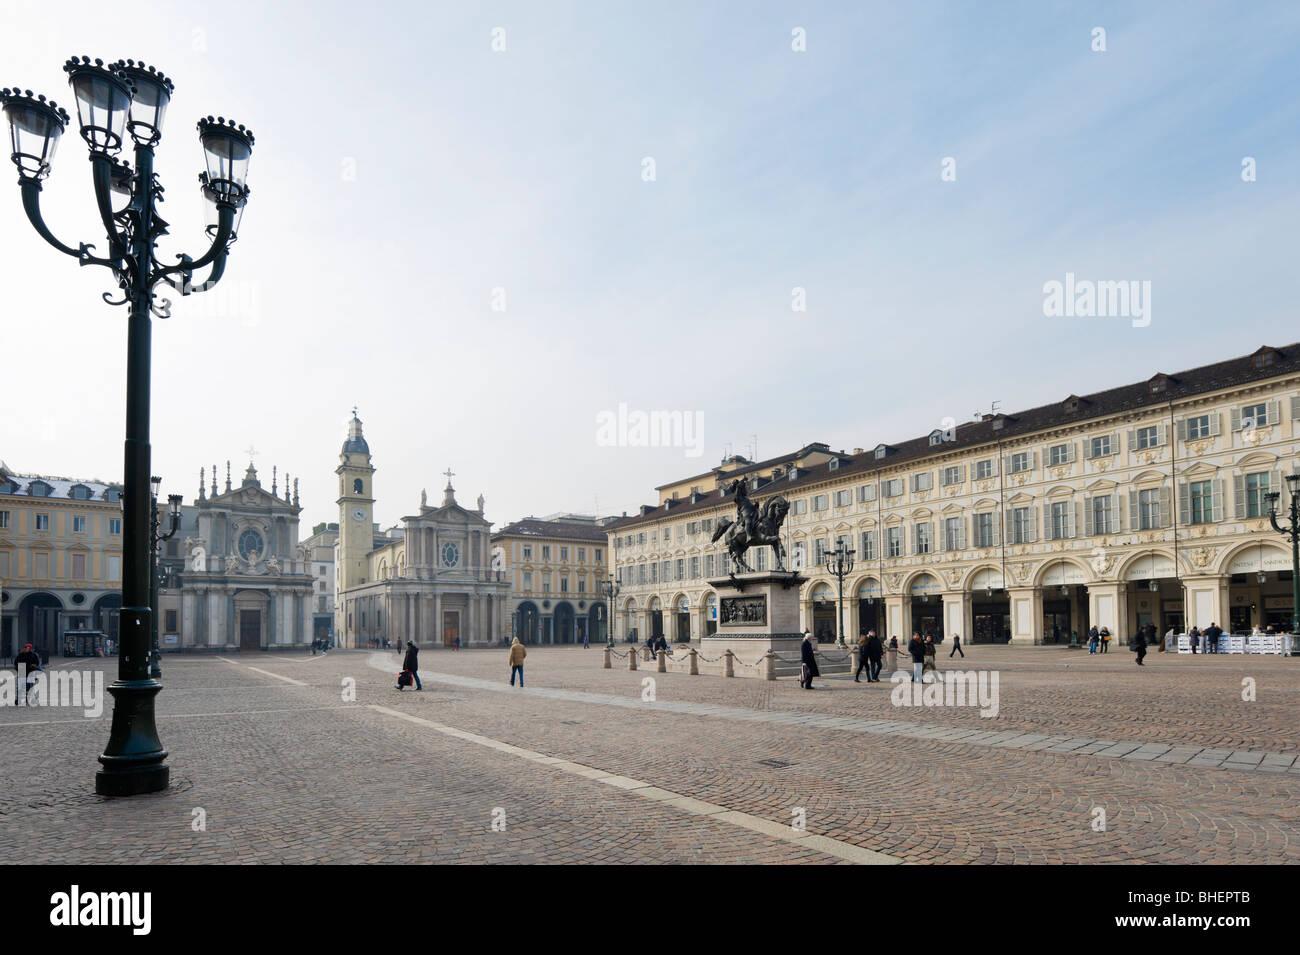 Piazza San Carlo in the historic city centre, Turin, Piemonte, Italy - Stock Image